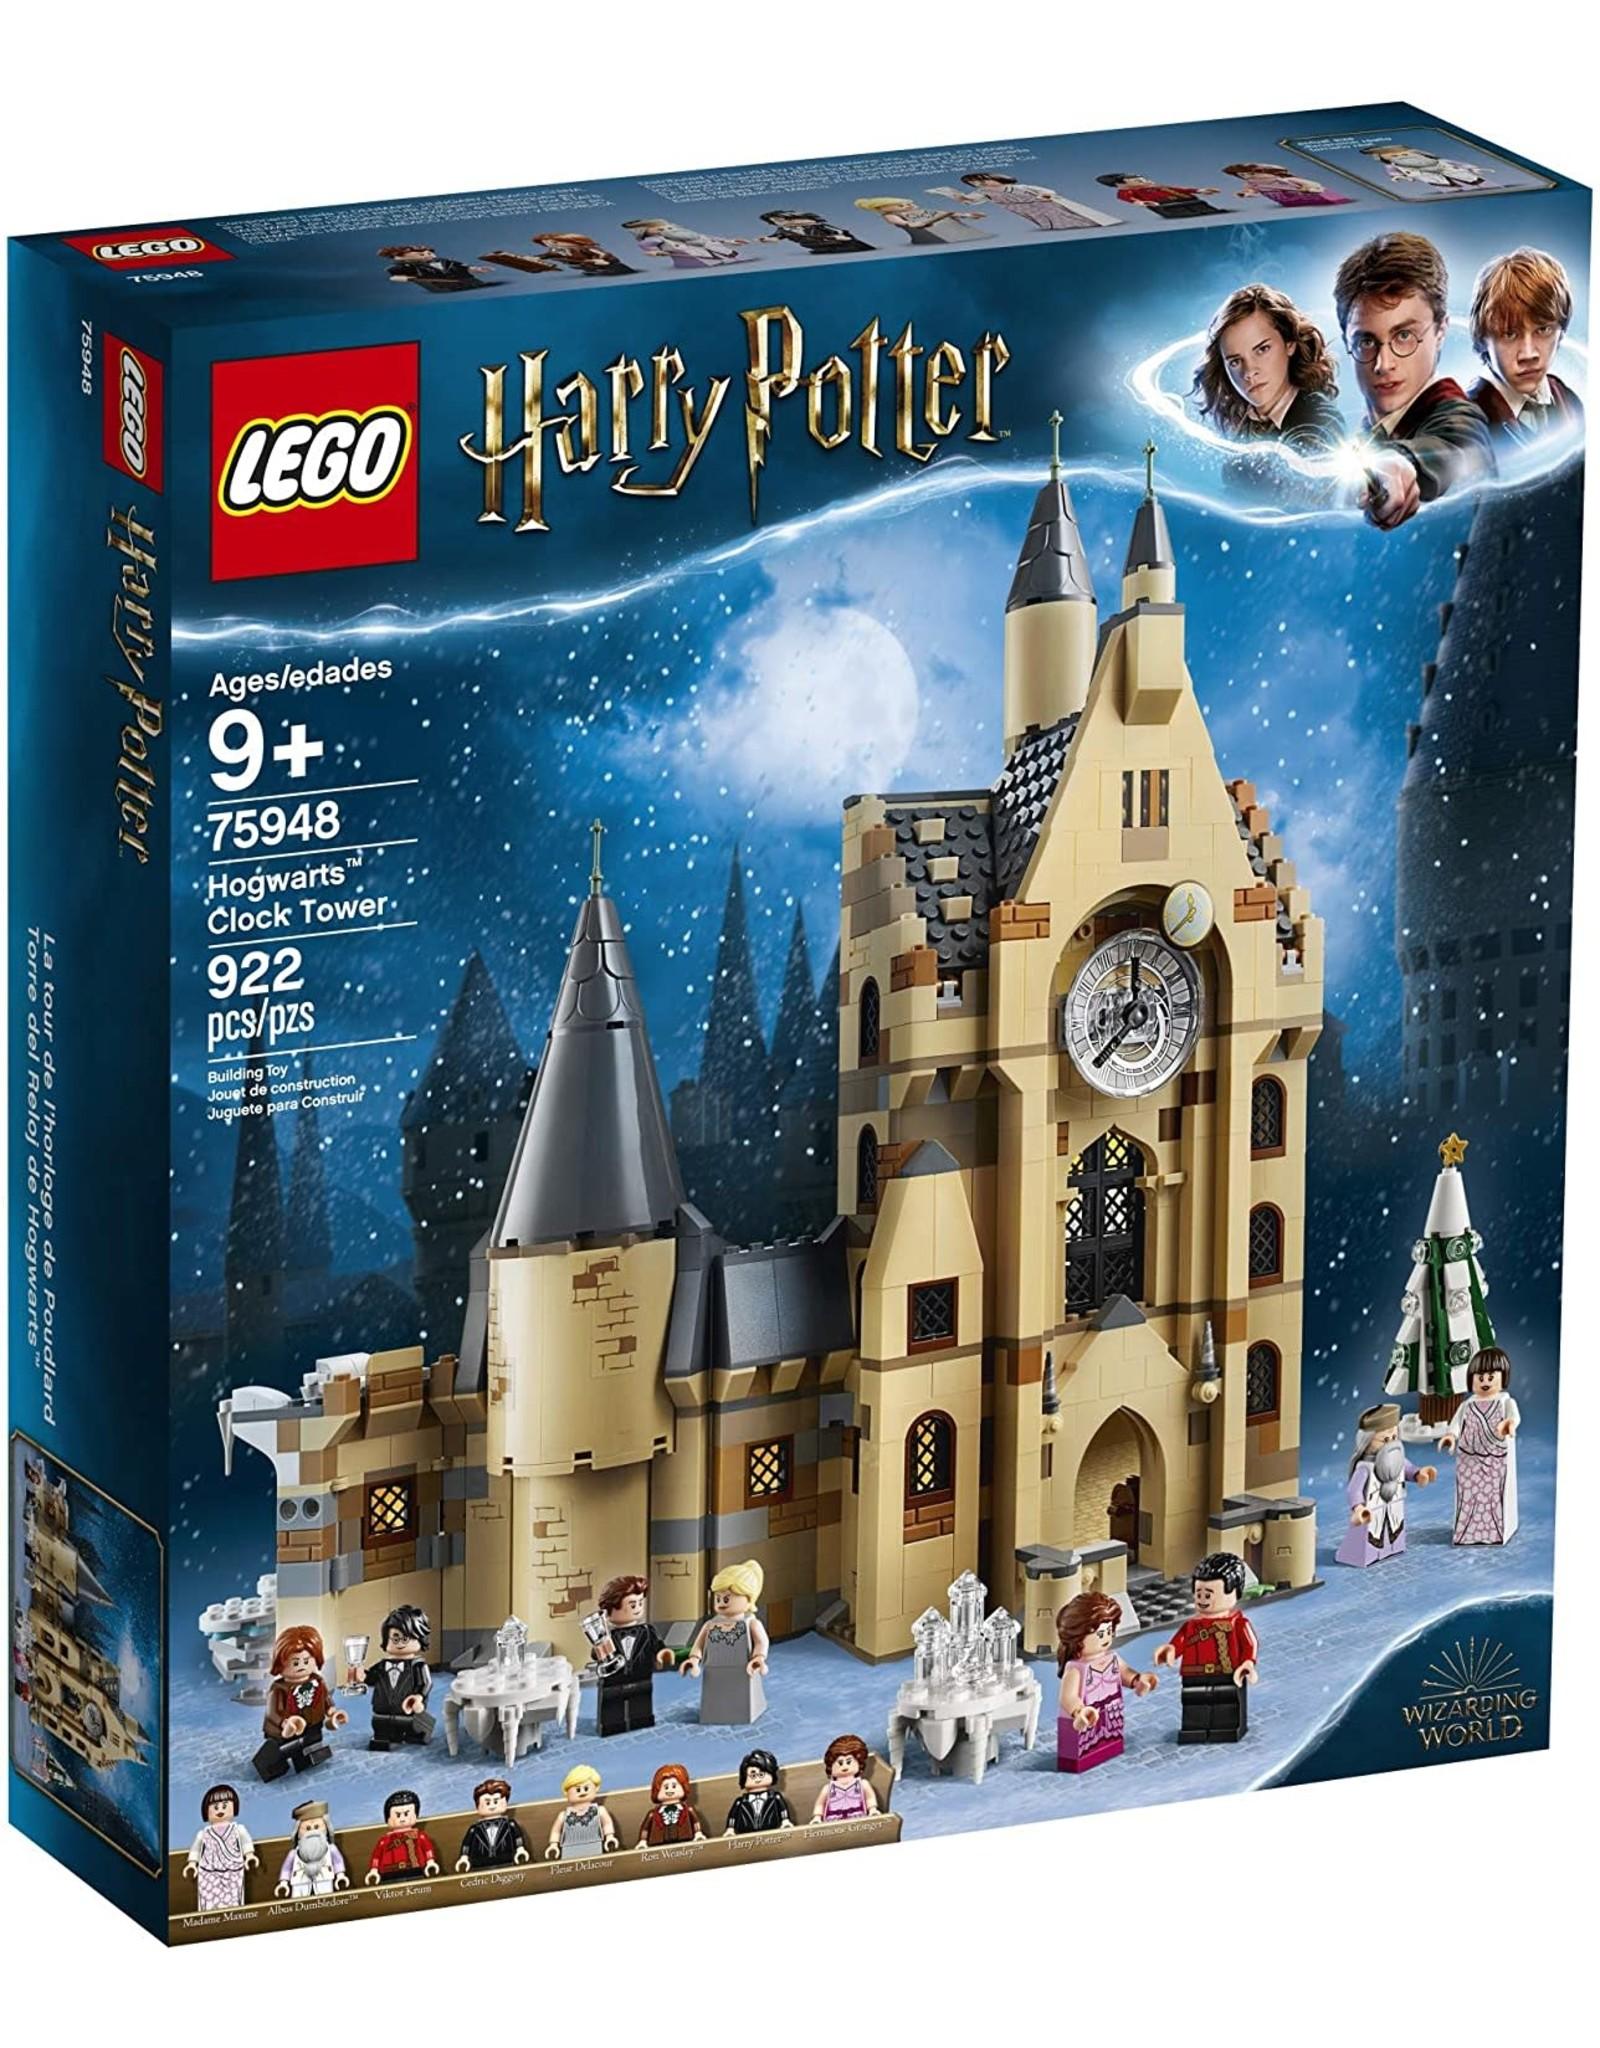 Lego LEGO Harry Potter Hogwart's Clock Tower